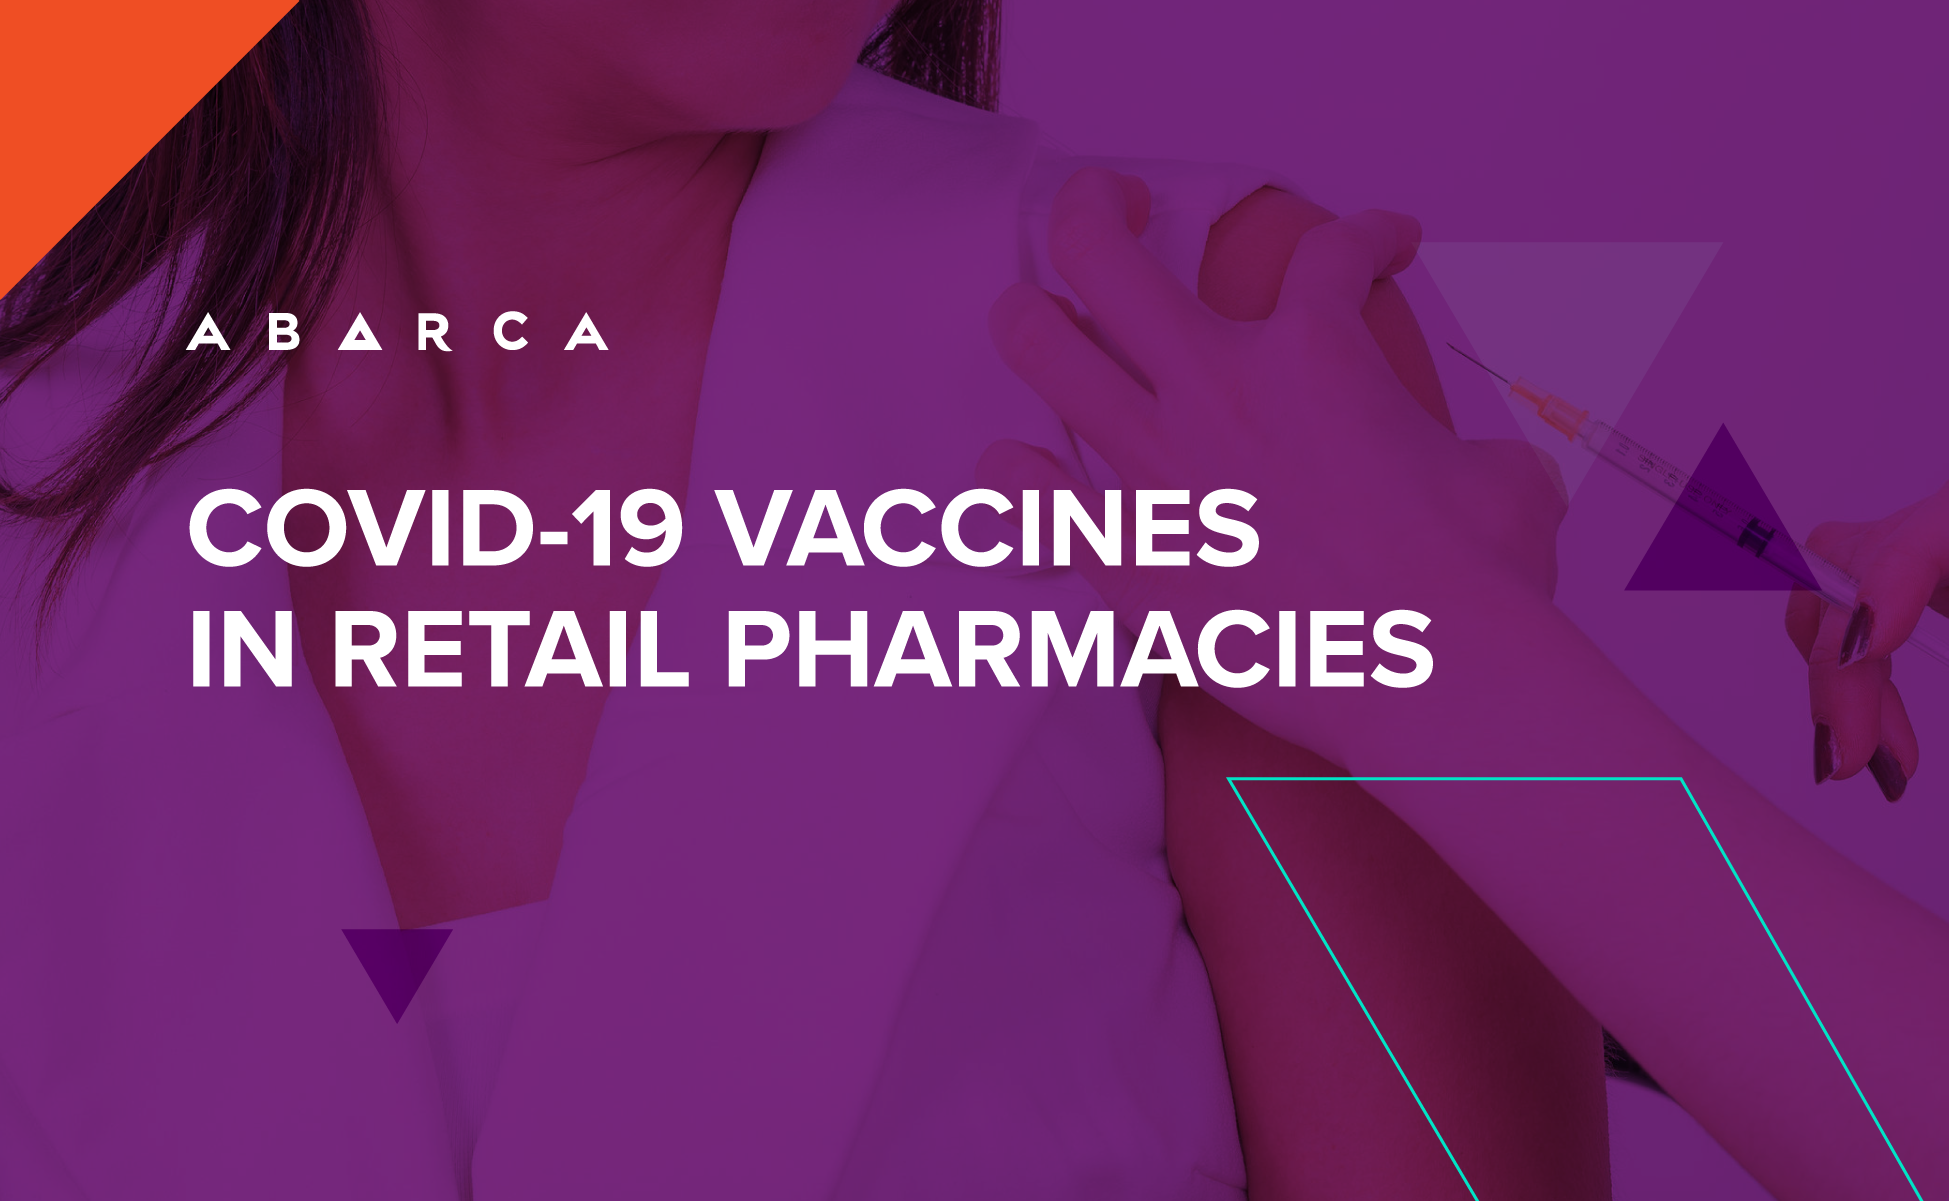 Abarca Health: COVID-19 vaccines in retail pharmacies